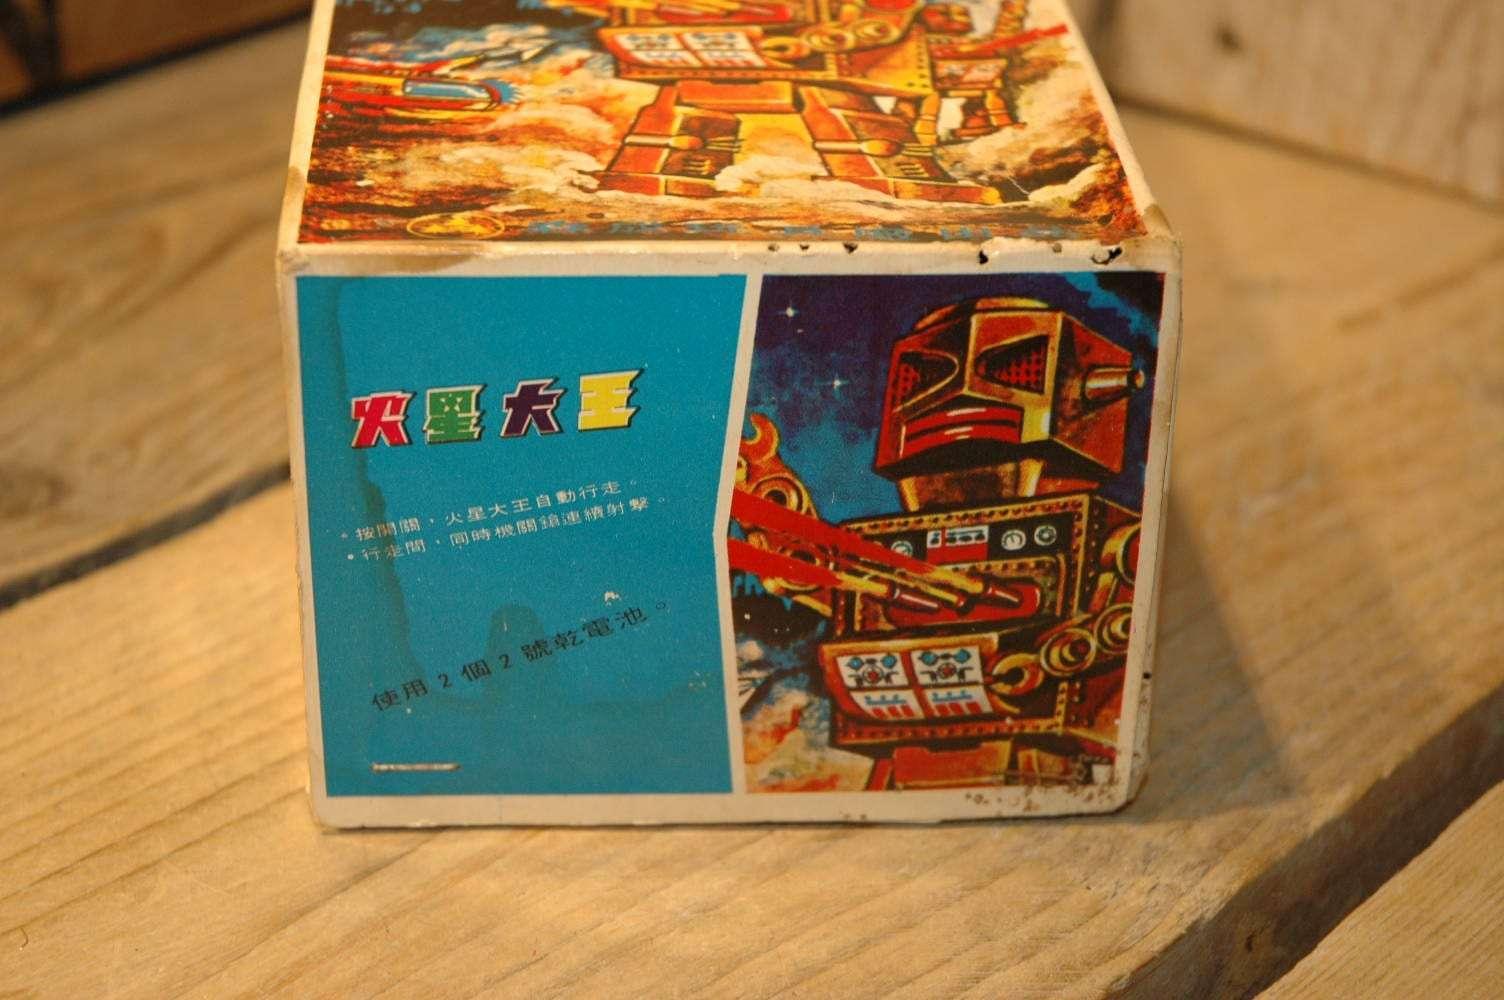 Shen Chen Toy Factory - King Kong of Mars aka Flower Robot